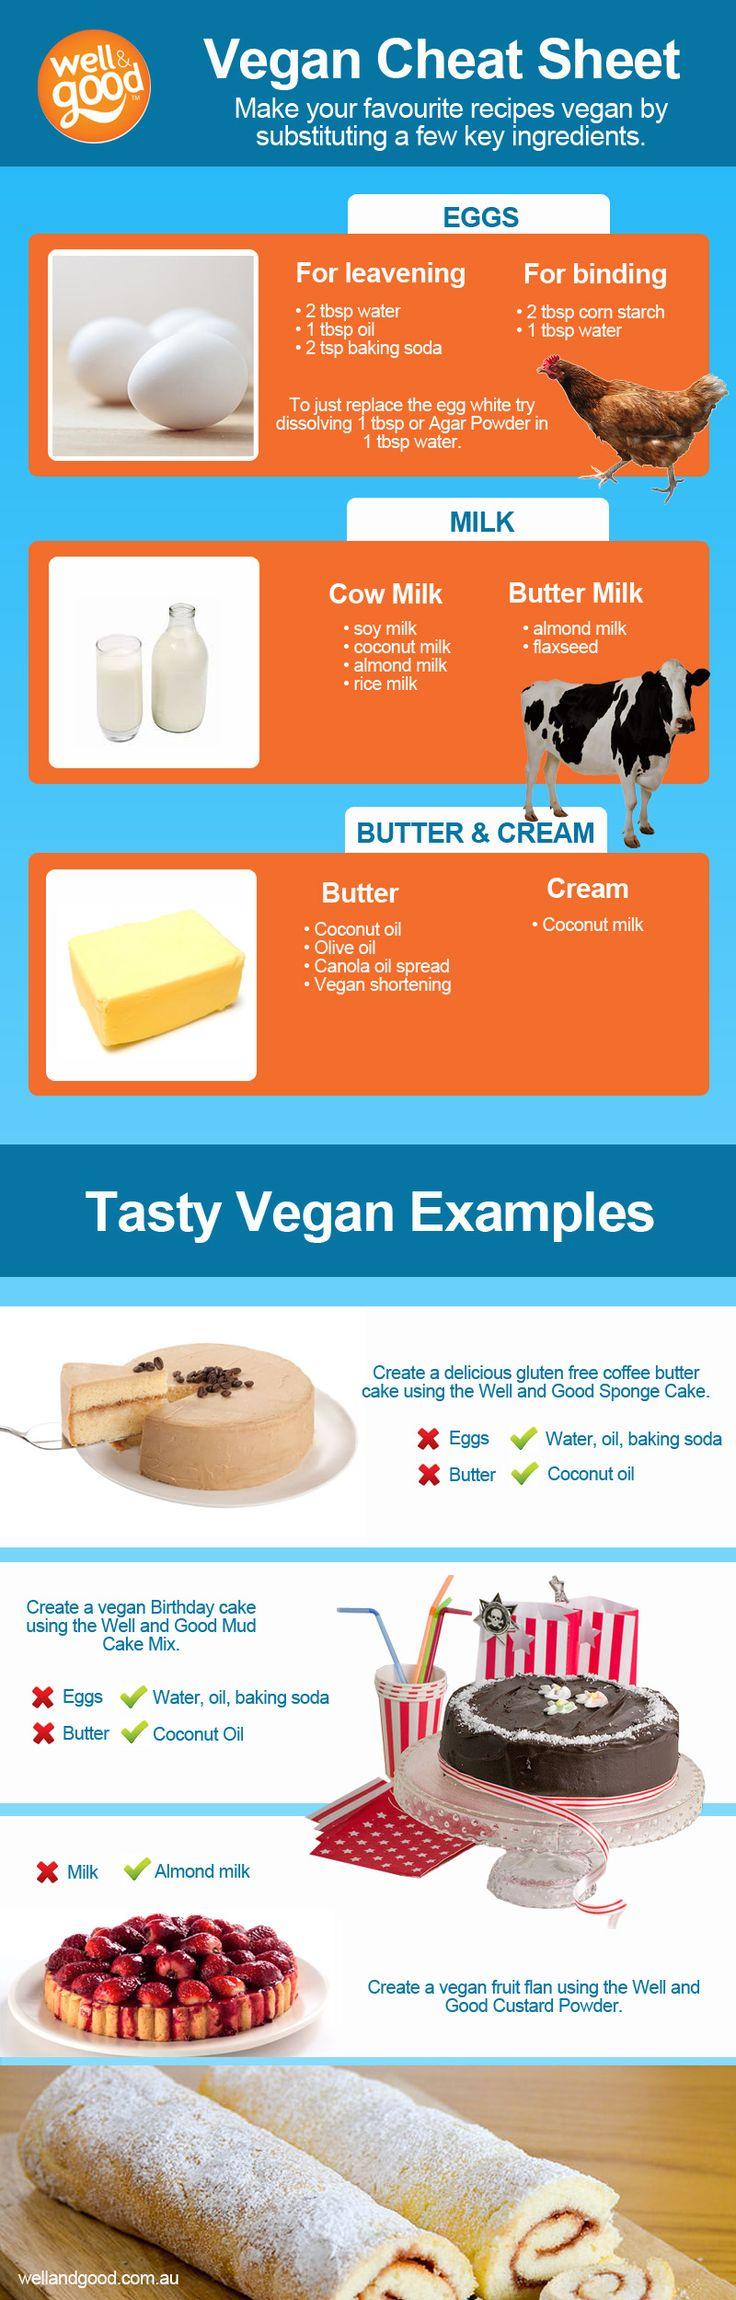 A handy infographic which offers useful Vegan substitutes. #wellandgood #glutenfree #vegan